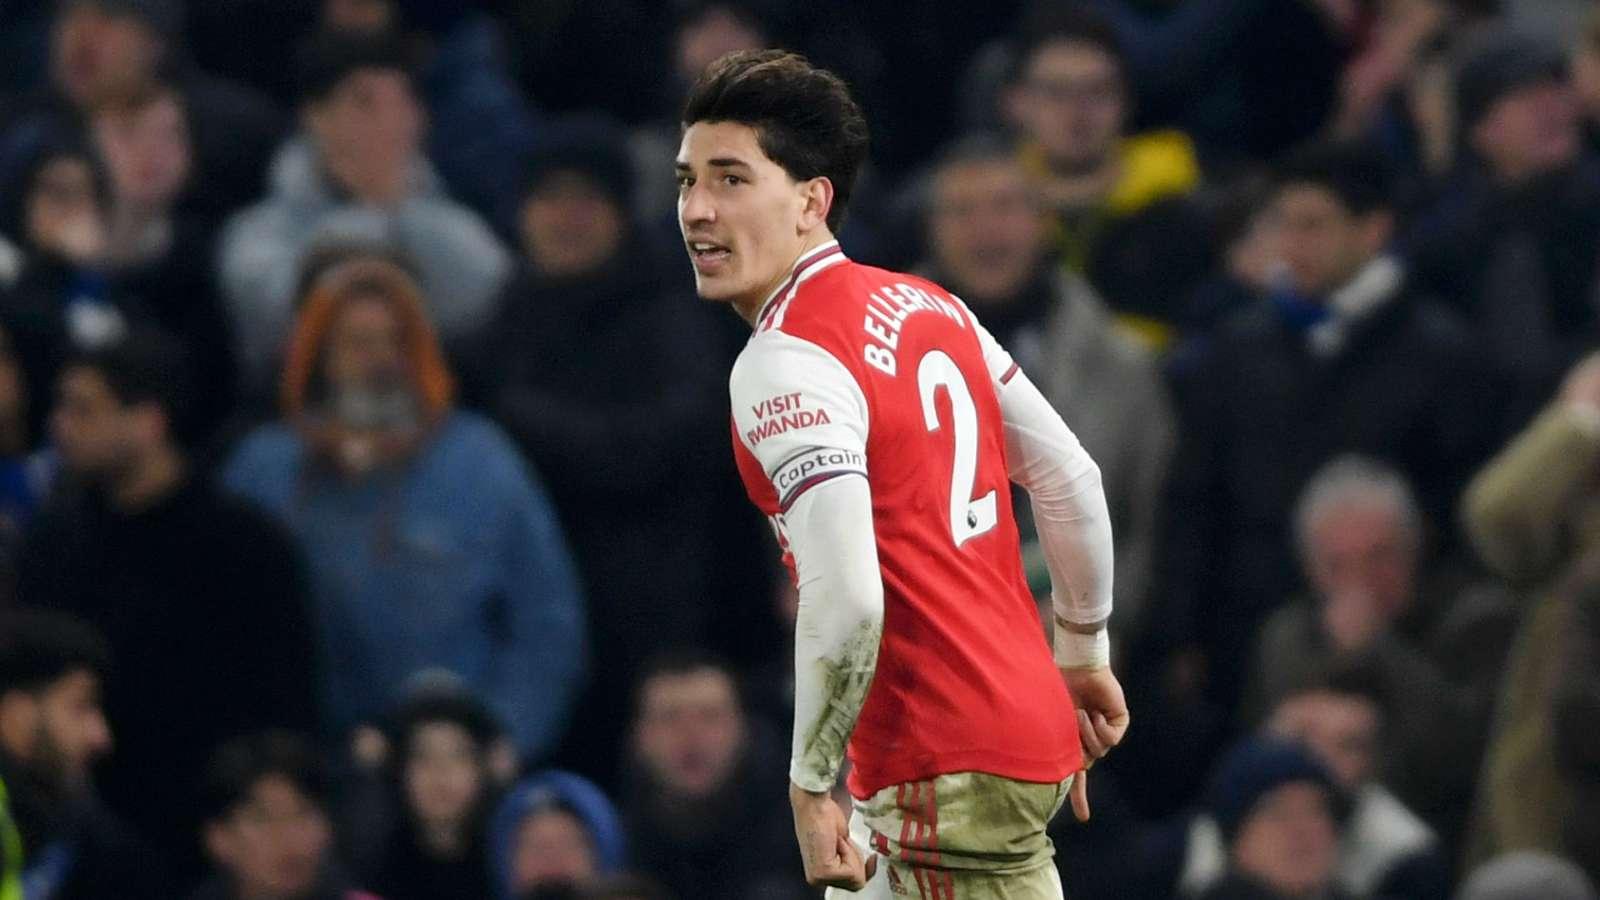 آرسنال-چلسی-لیگ برتر انگلیس-Arsenal-Chelsea-Premier League